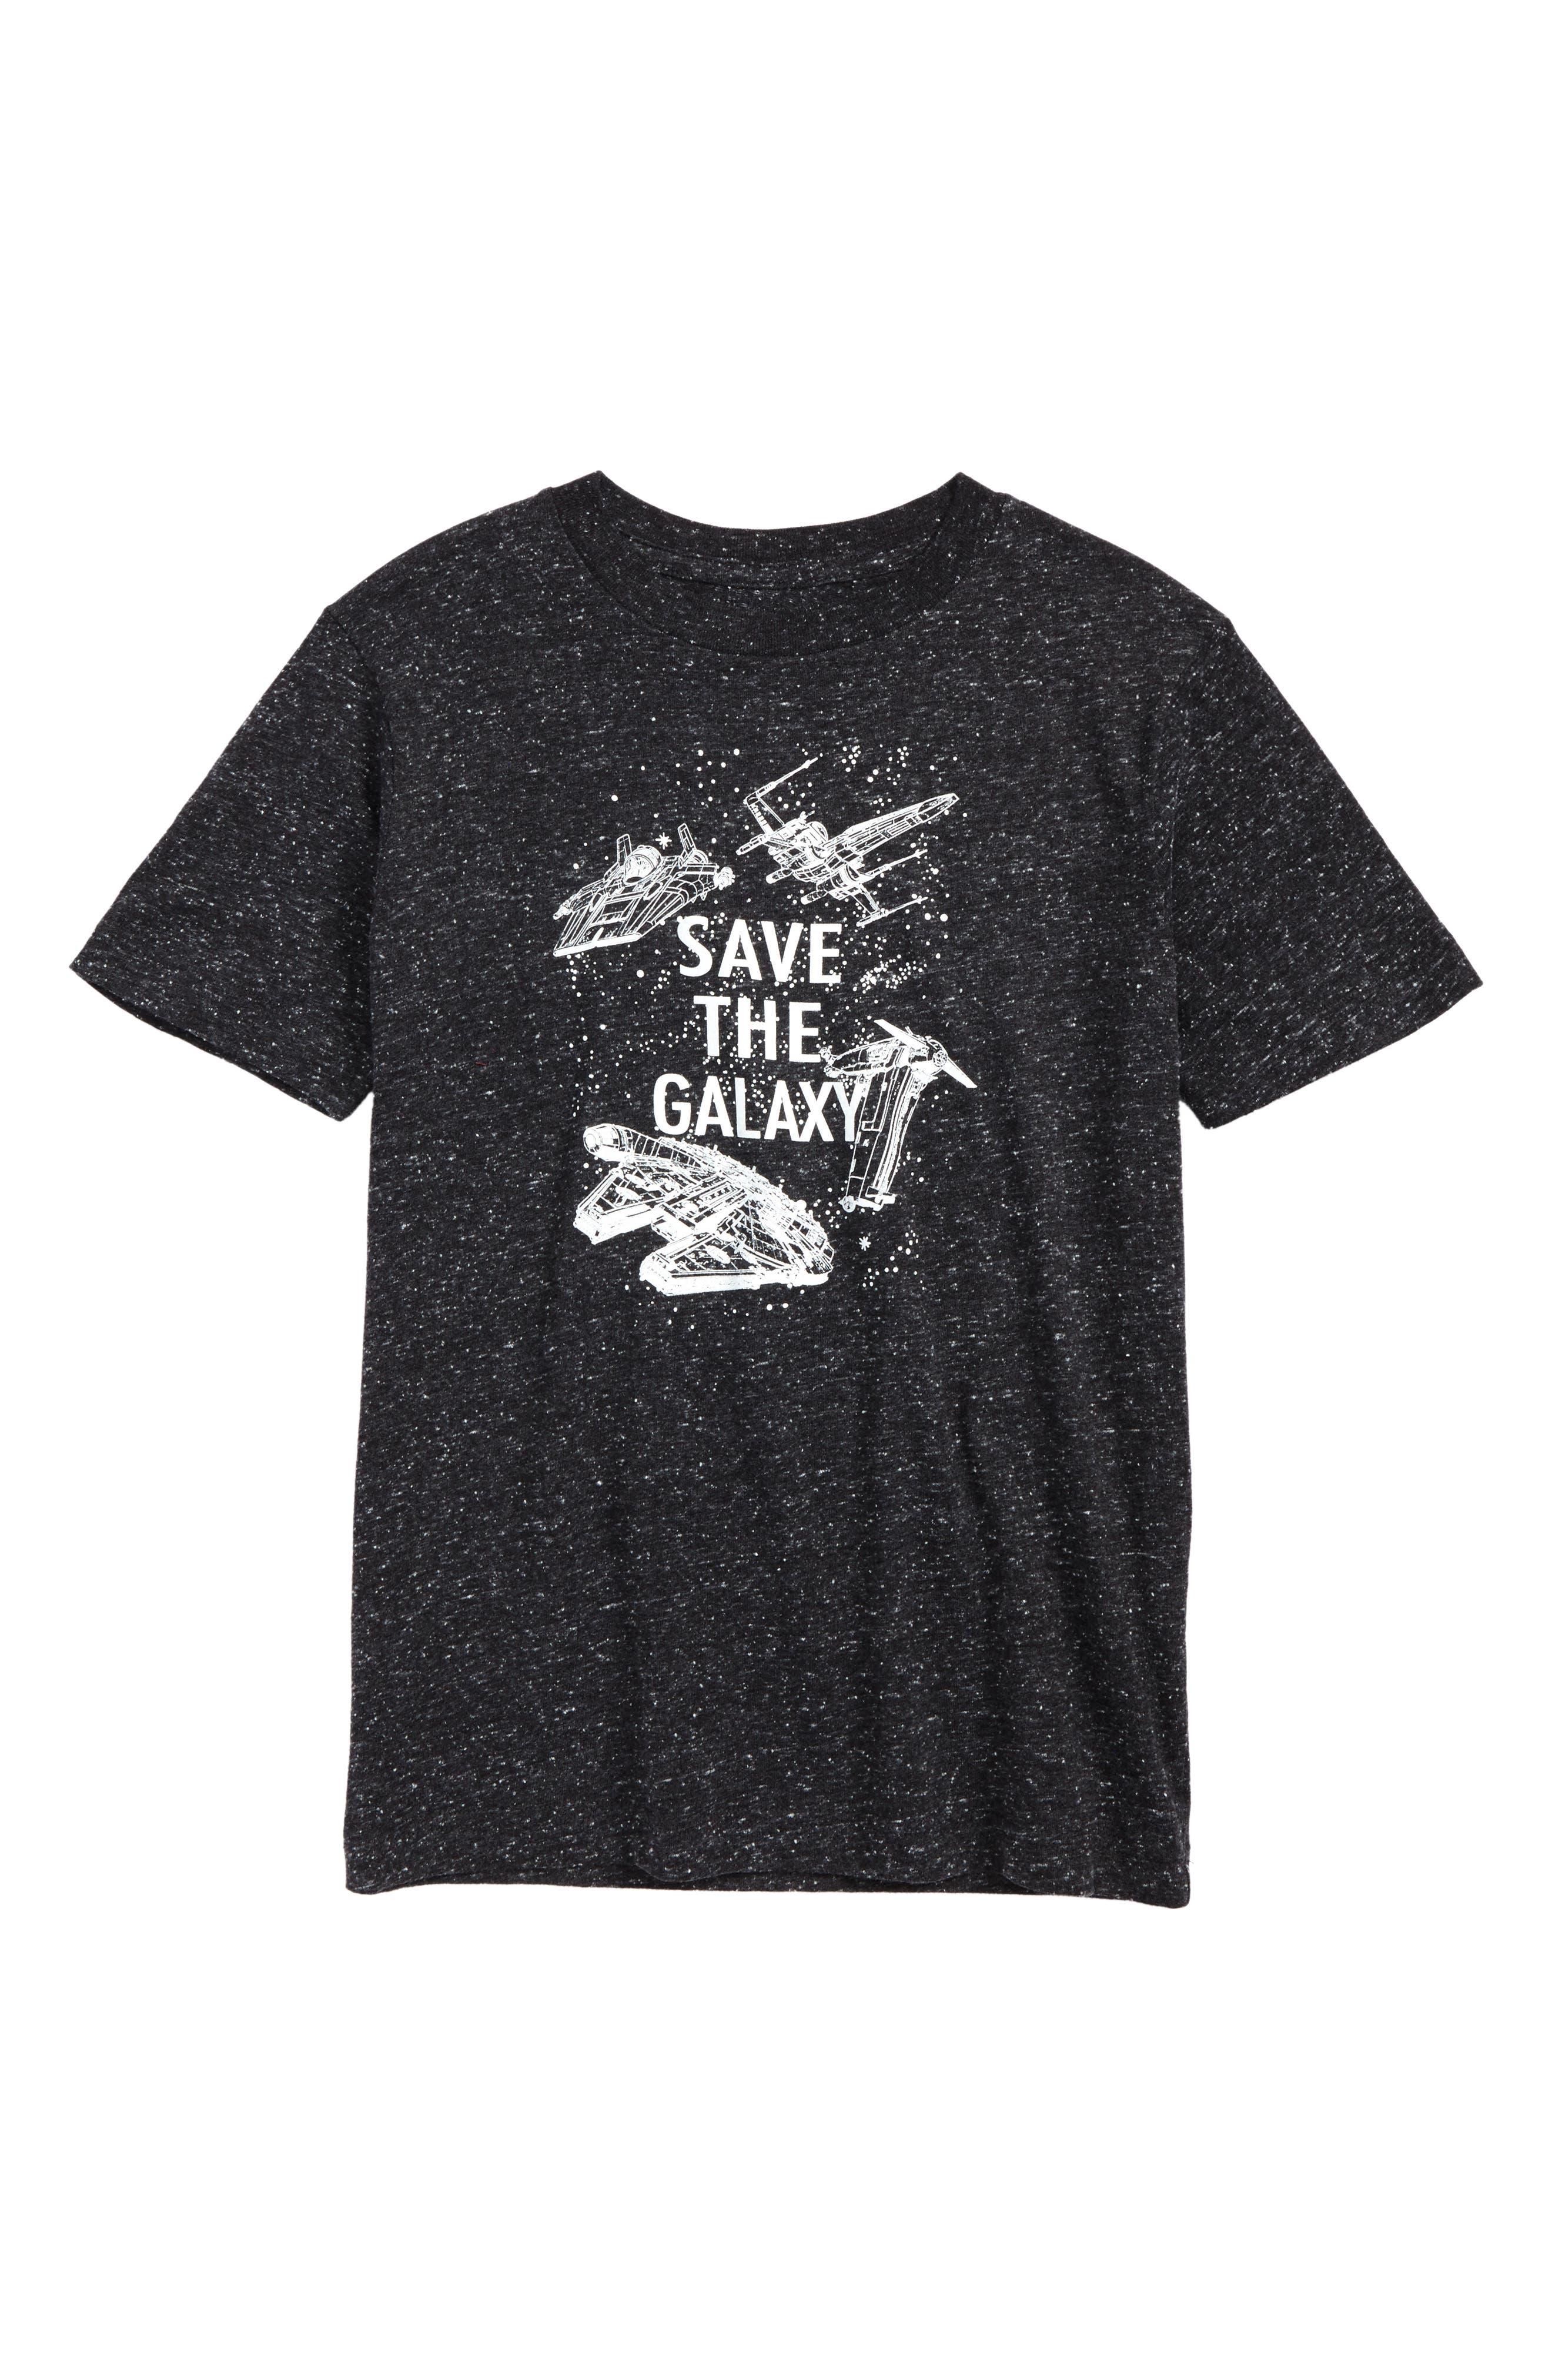 Star Wars - Save the Galaxy Glow in the Dark T-Shirt,                             Main thumbnail 1, color,                             Black